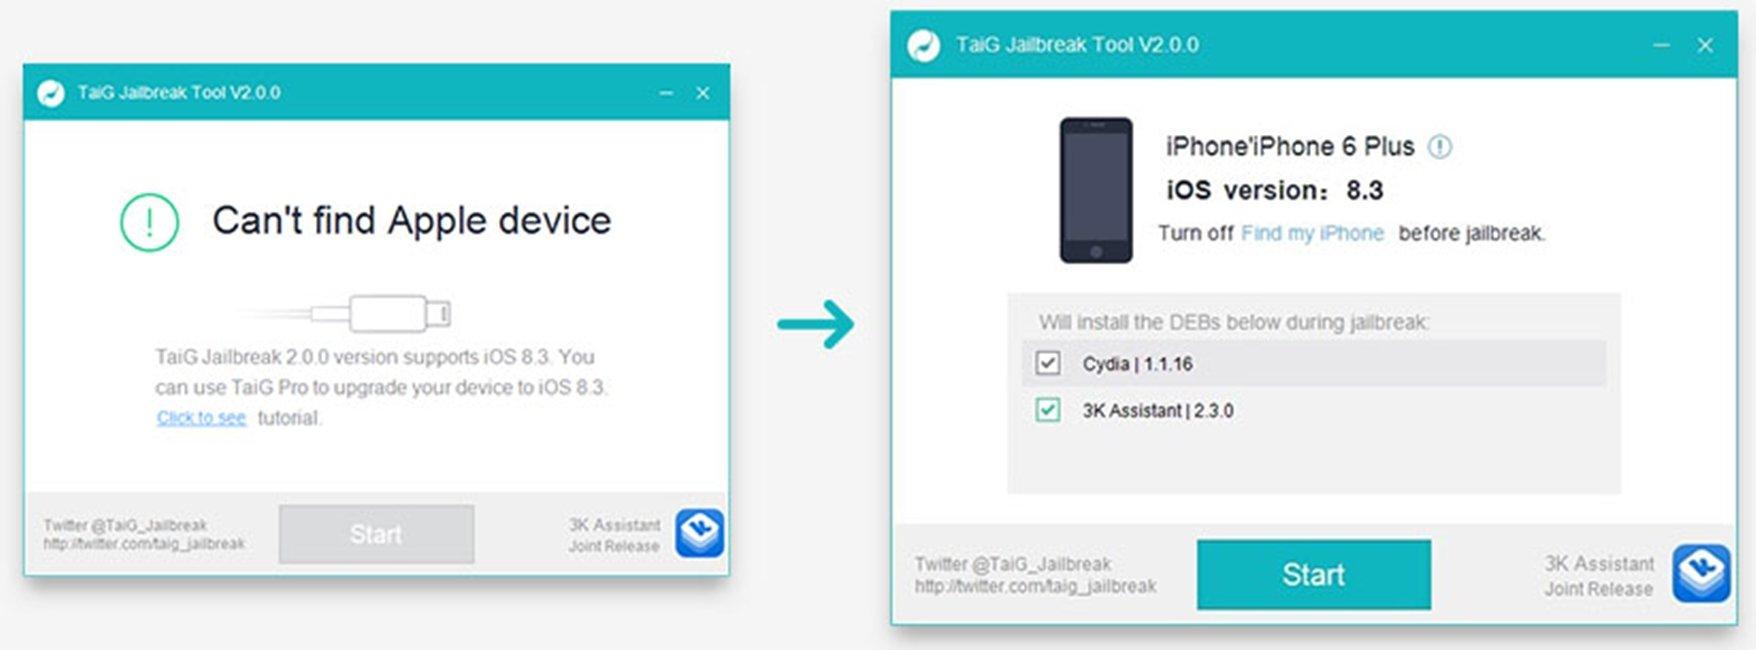 iOS 8.3 jailbreak iPhone iPad